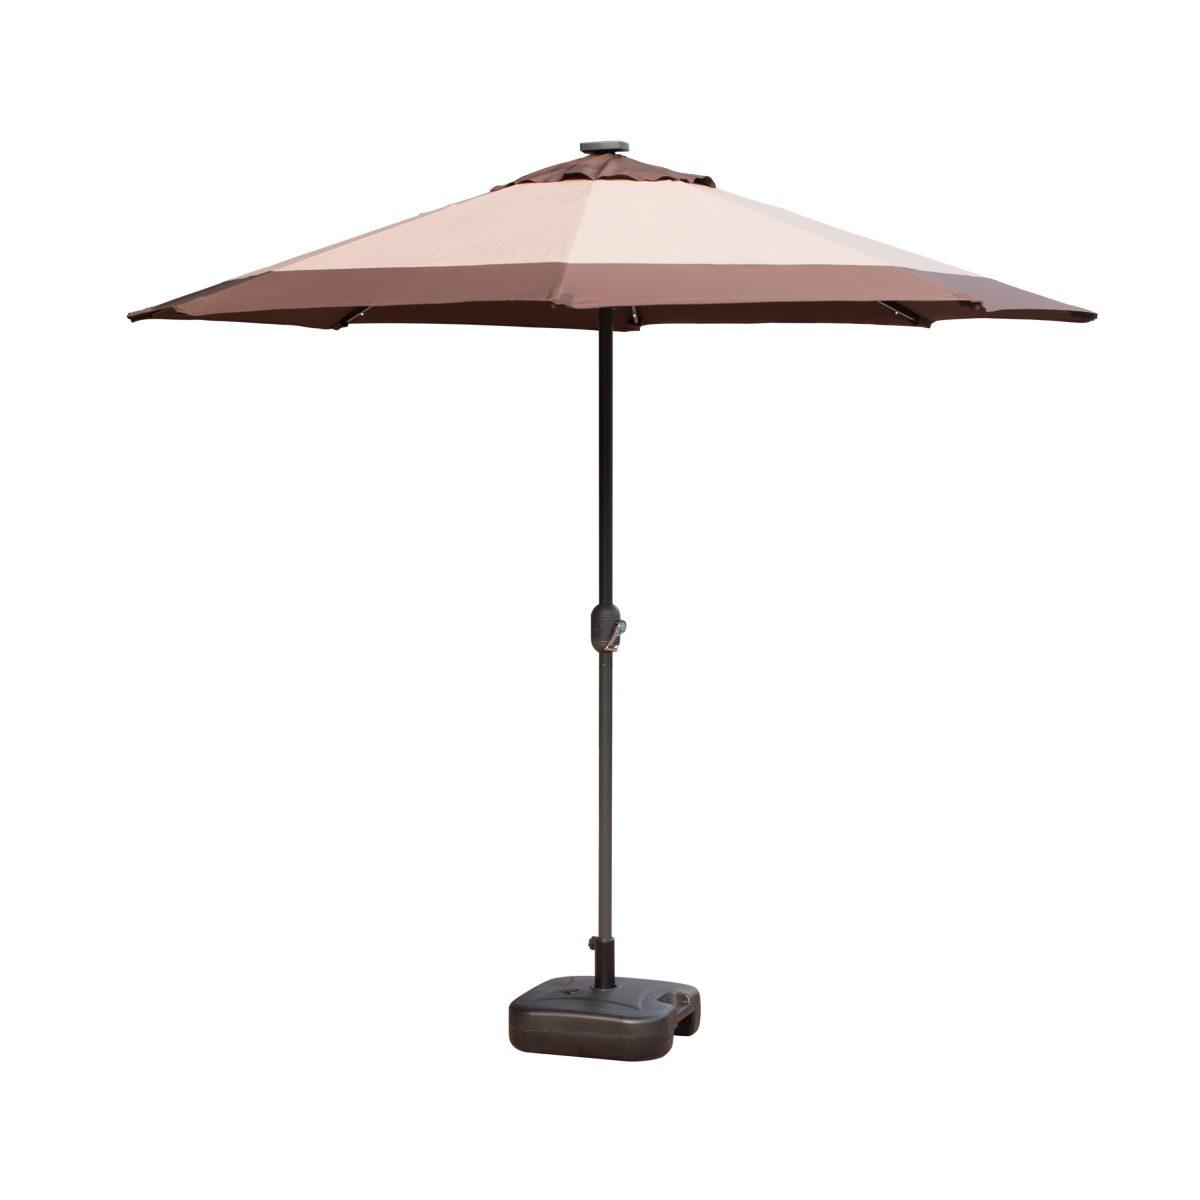 Borealis 9 Foot 30 LED Lights Coffee And Khaki Patio Umbrella Garden Outdoor  Sunshade Market